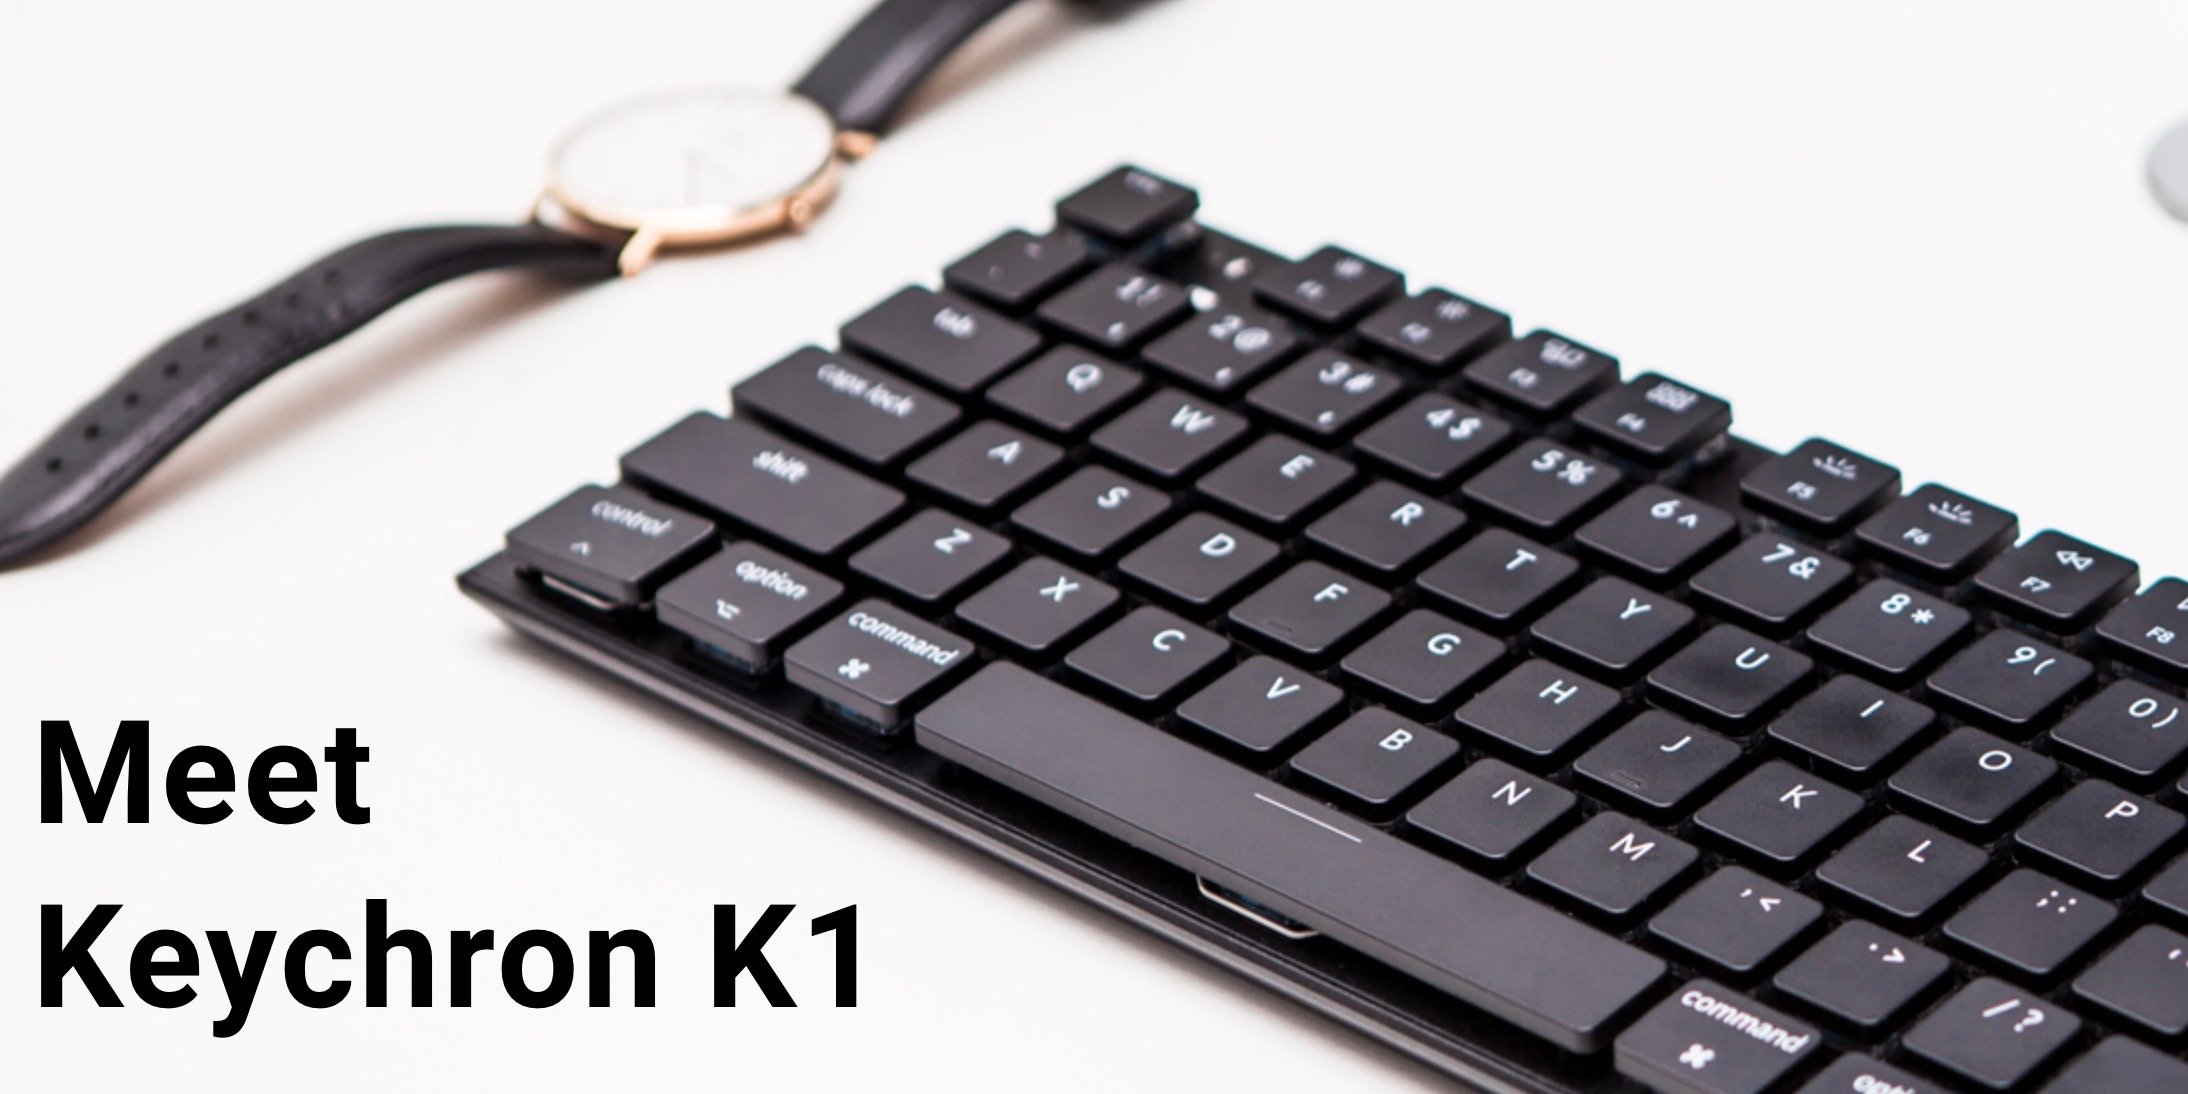 Magic Keyboard's slim design meets mechanical keyboard with the wireless Keychron K1 for Mac with dedicated Siri key